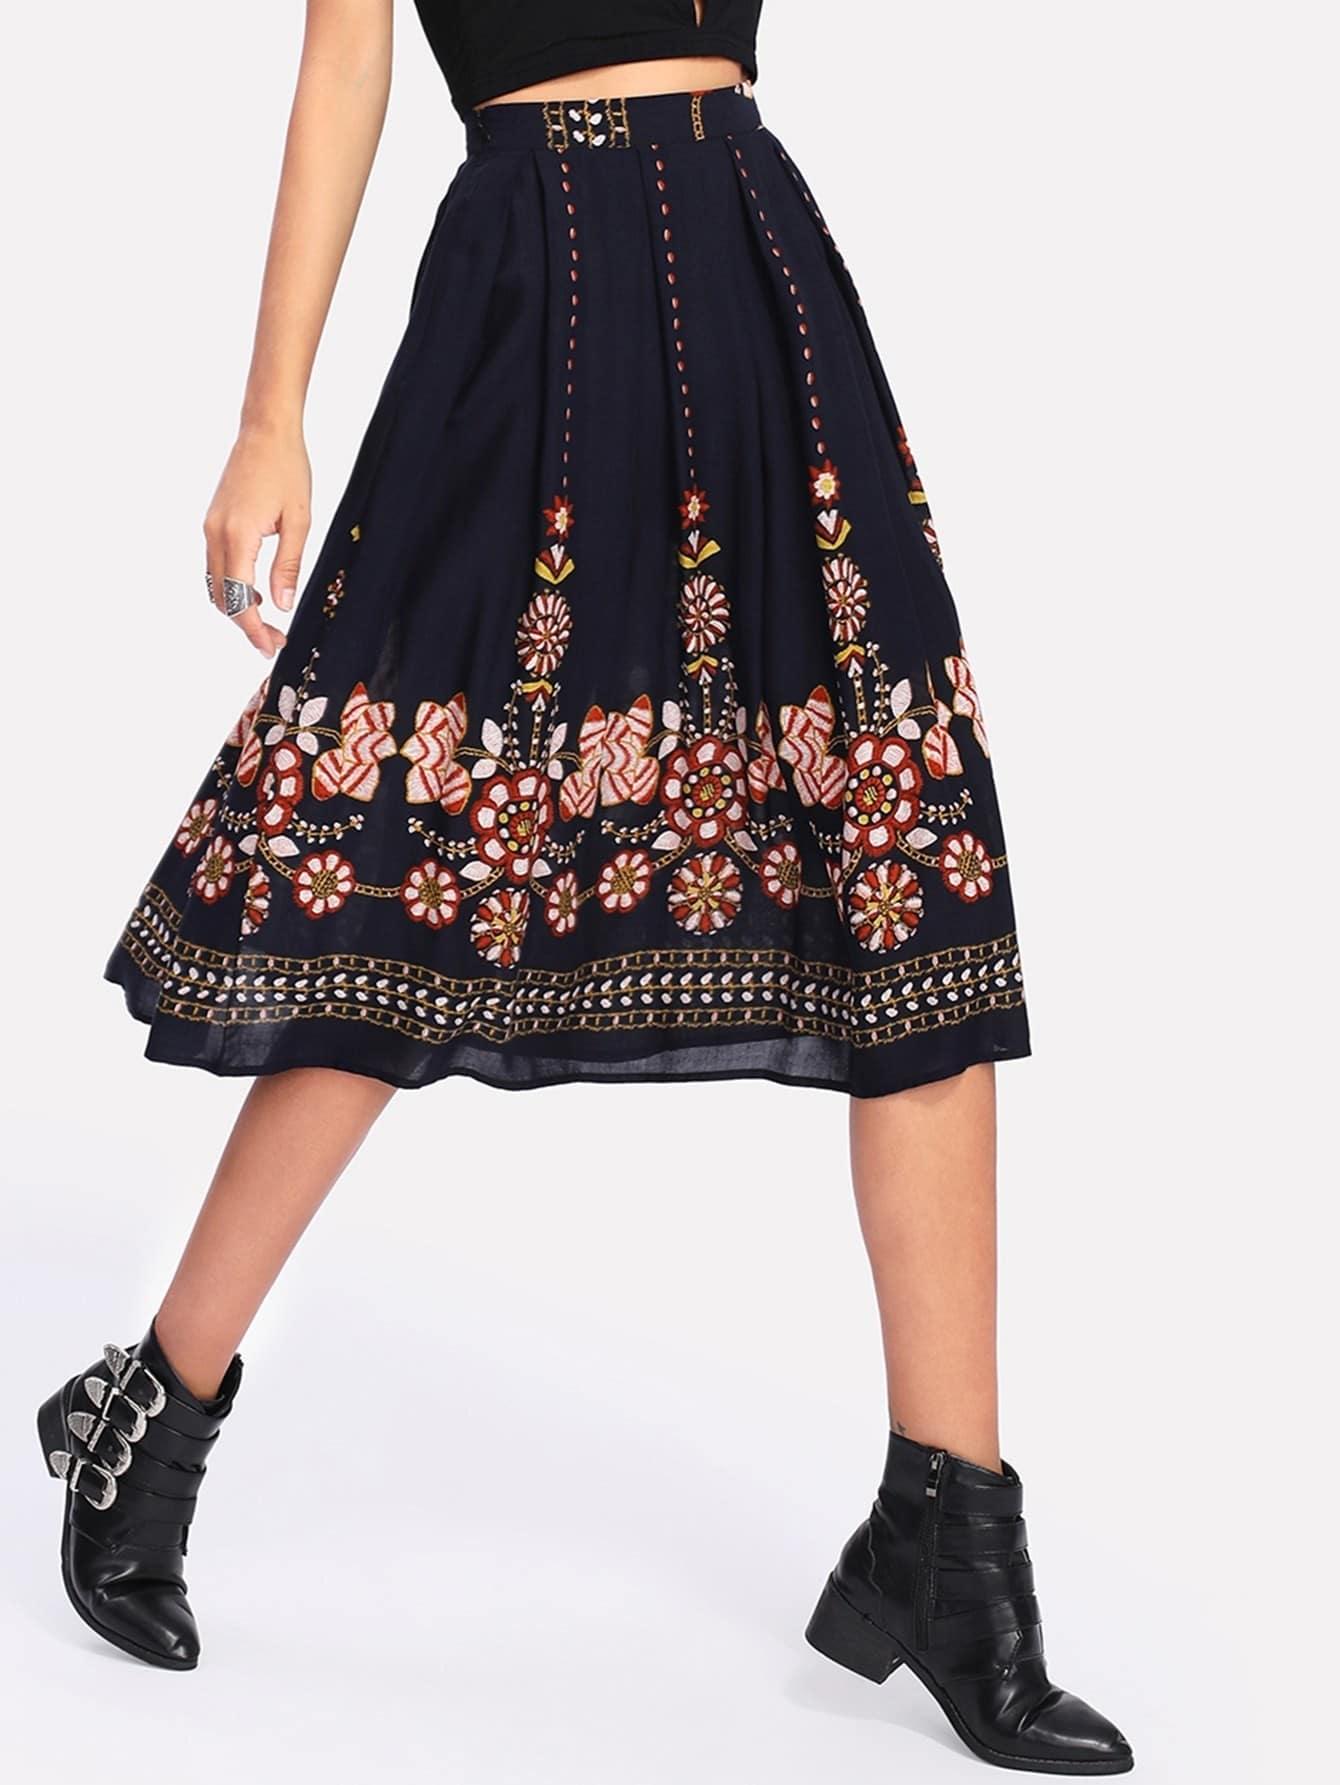 Botanical Print Flare Skirt пижама жен mia cara майка шорты botanical aw15 ubl lst 264 р 42 44 1119503